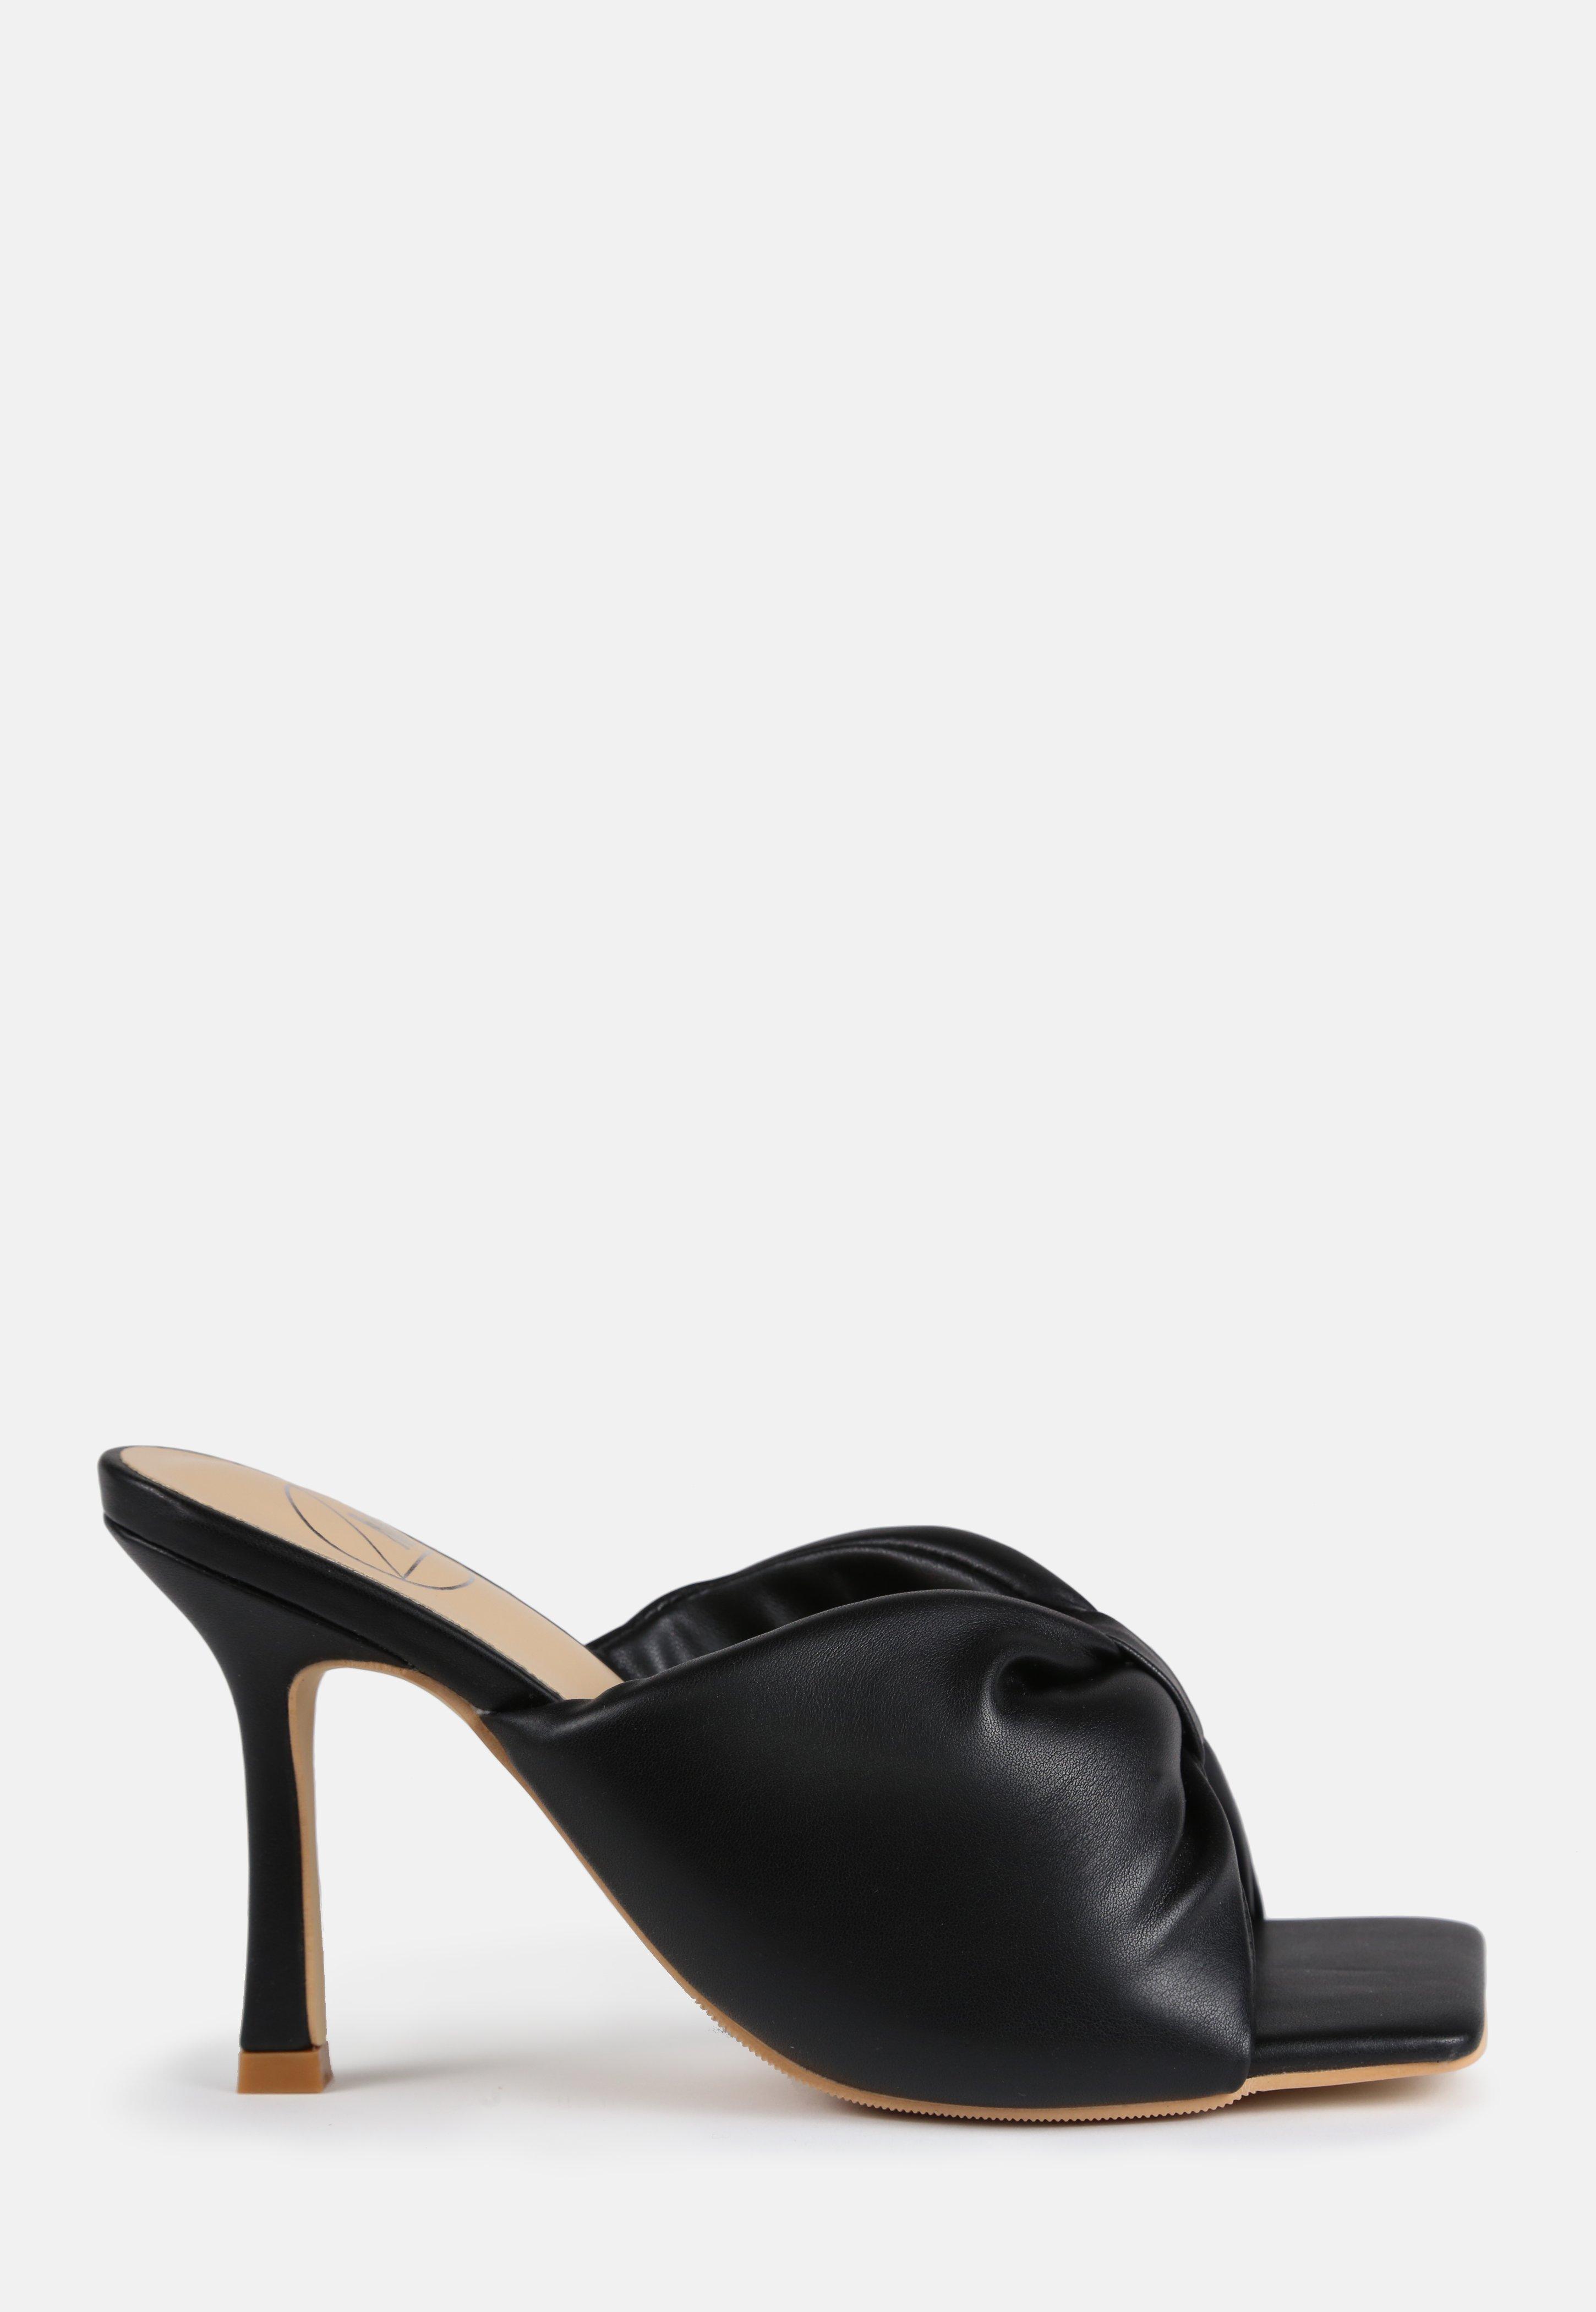 Mules | Heel Mules | Mules Shoes